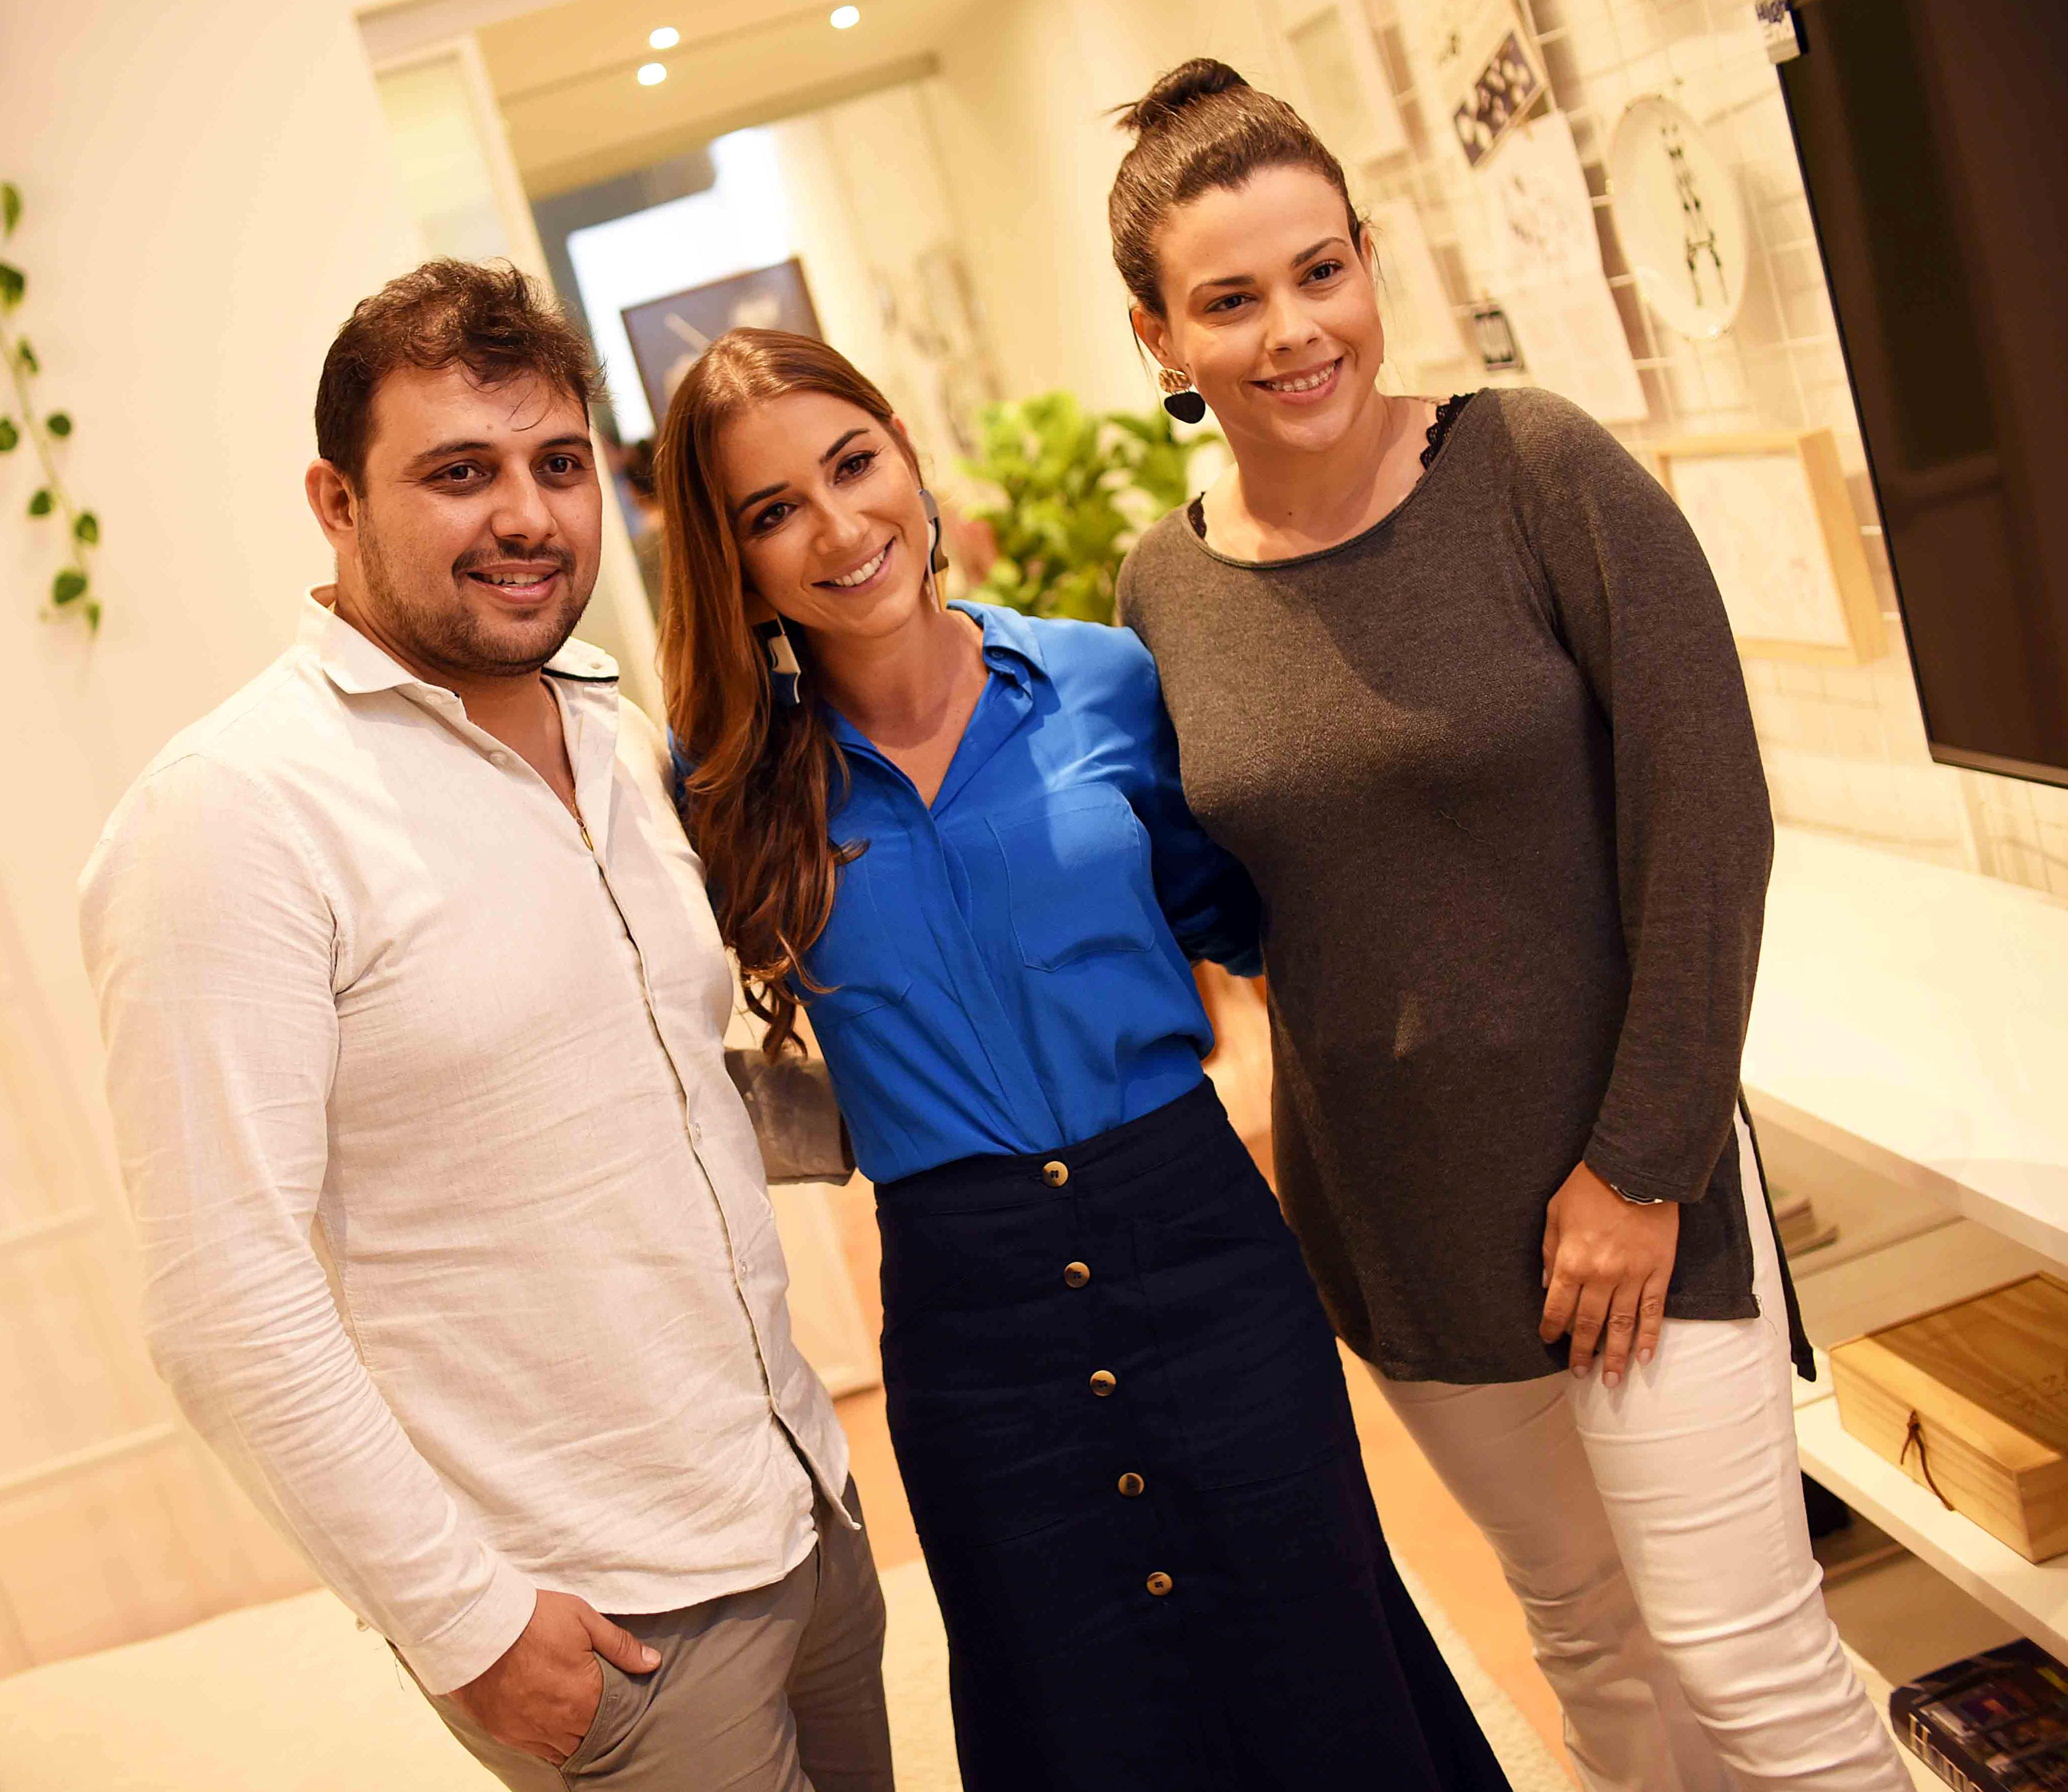 Clóvis Alvarenga, Marcella Bacellar e Lili Nascimento /Foto: Ari Kaye